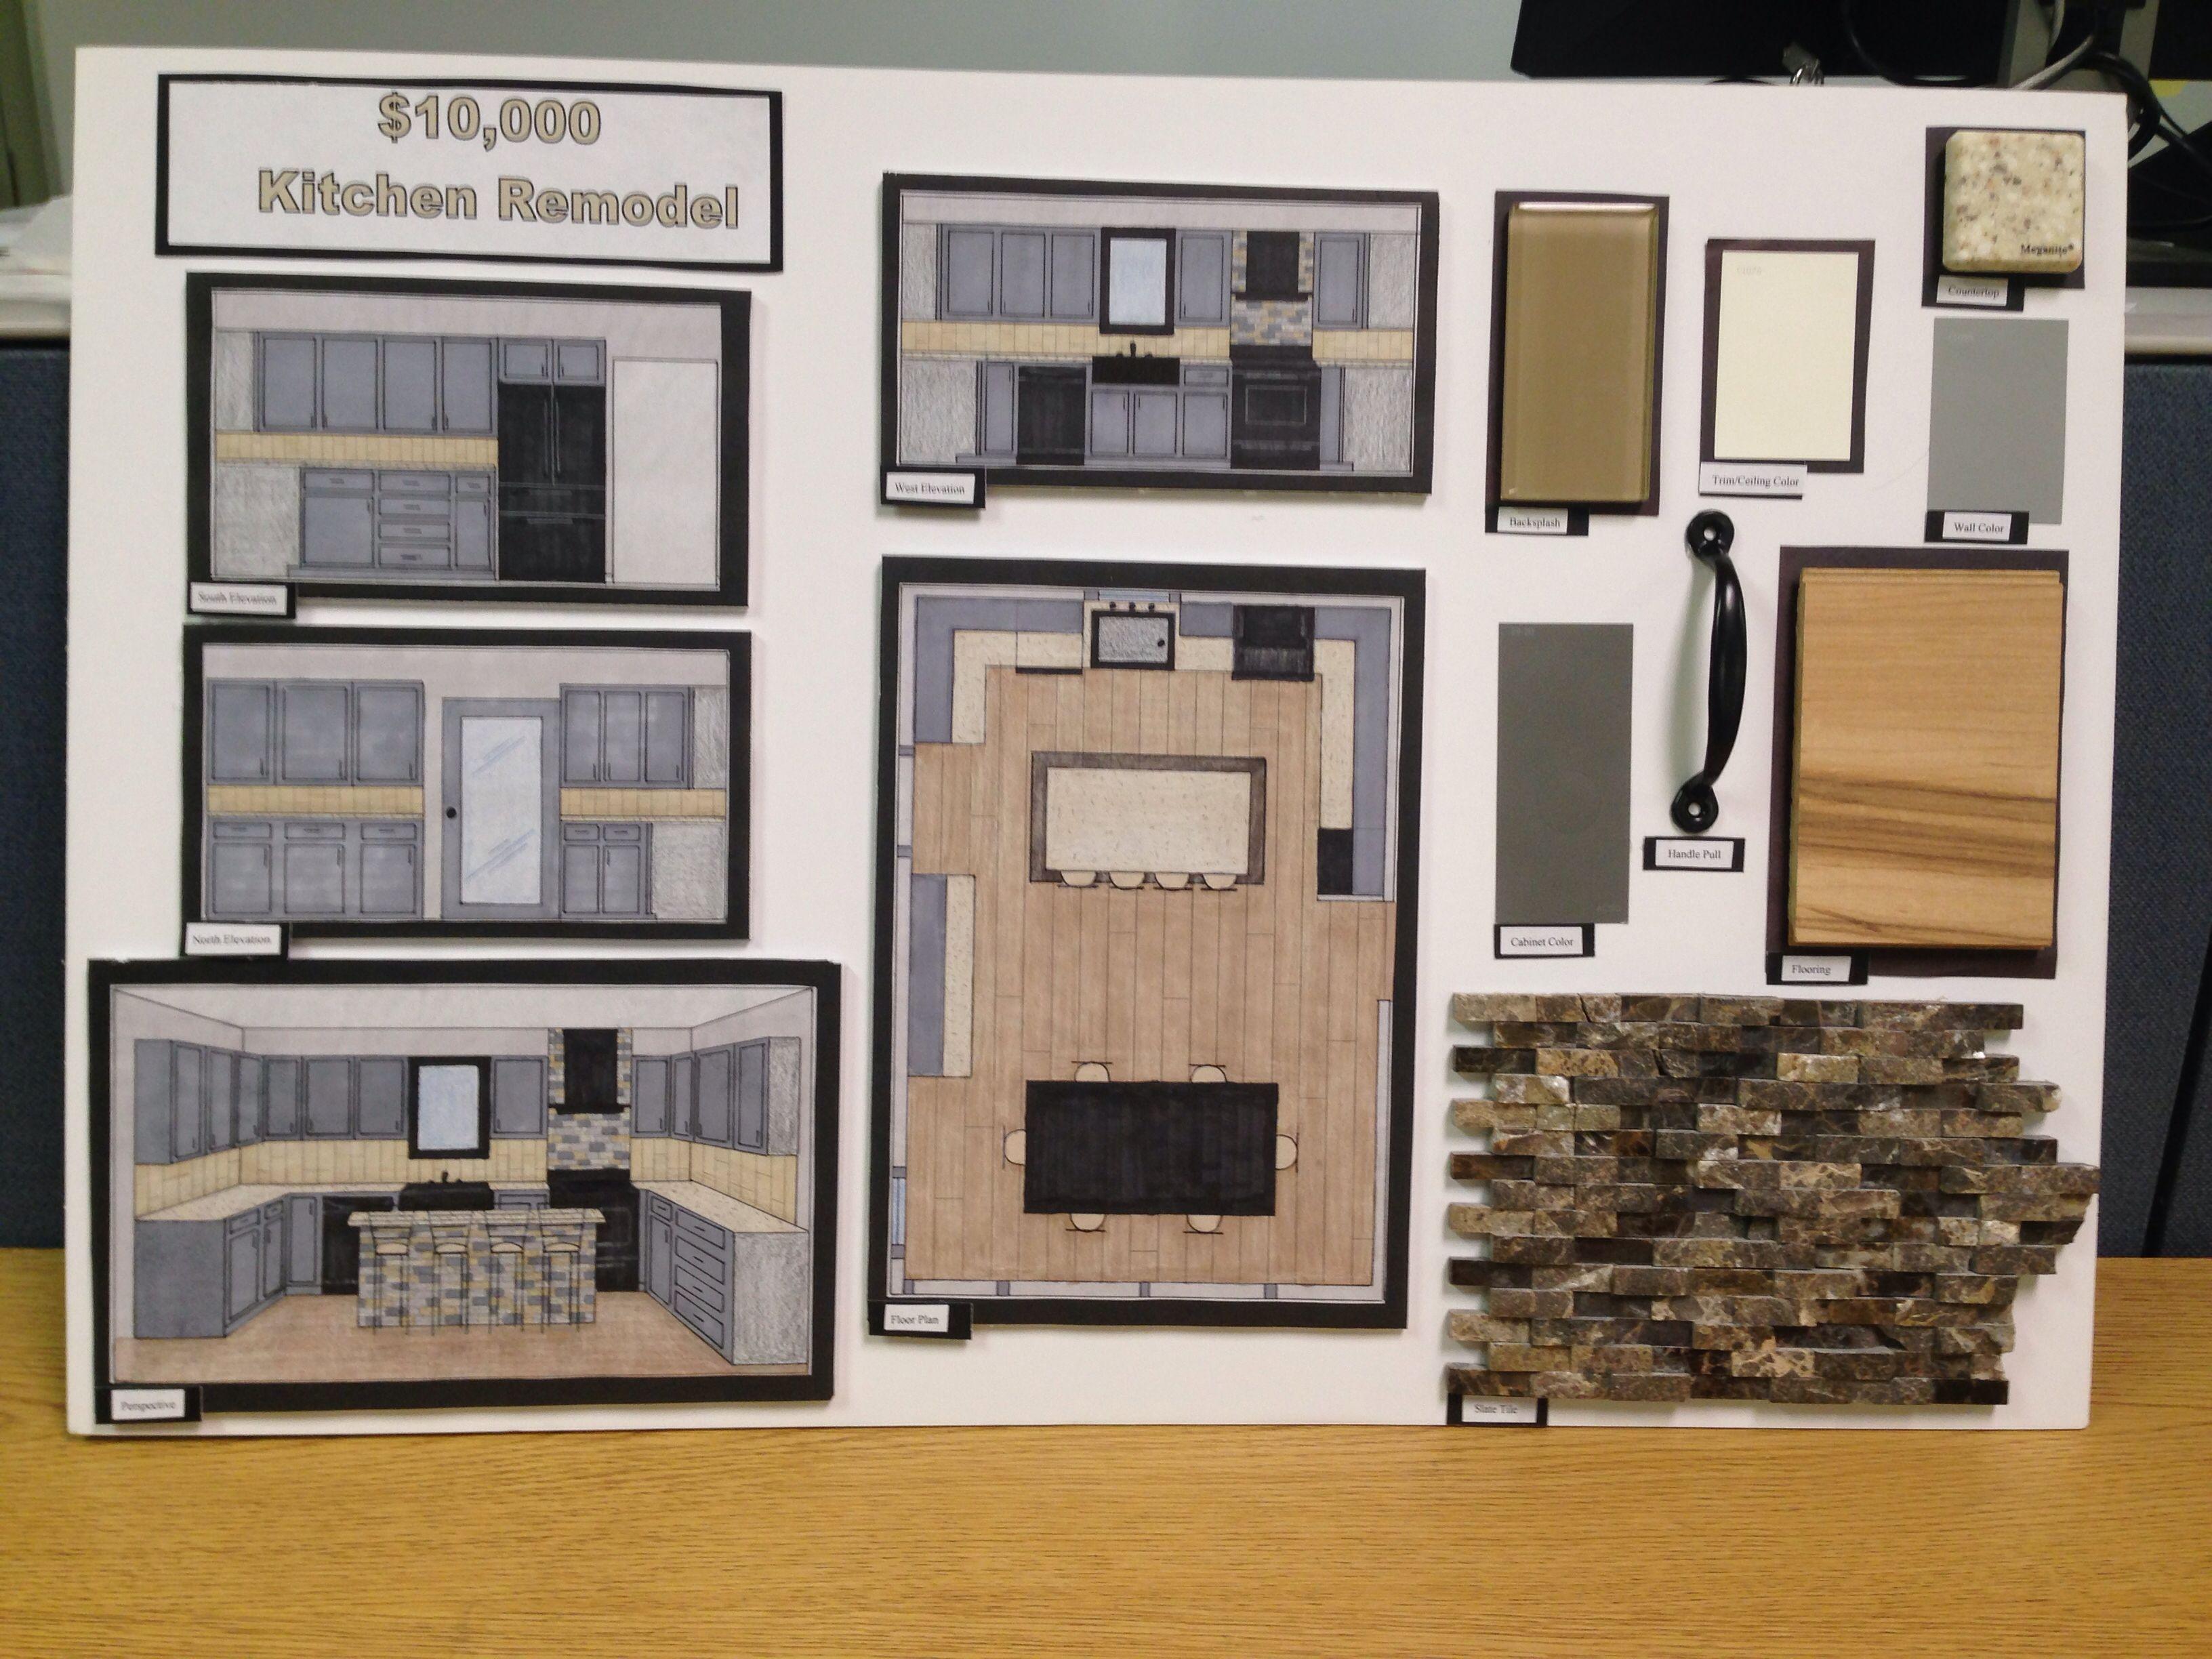 Kitchen renovation board interior design pinterest for To do board for kitchen